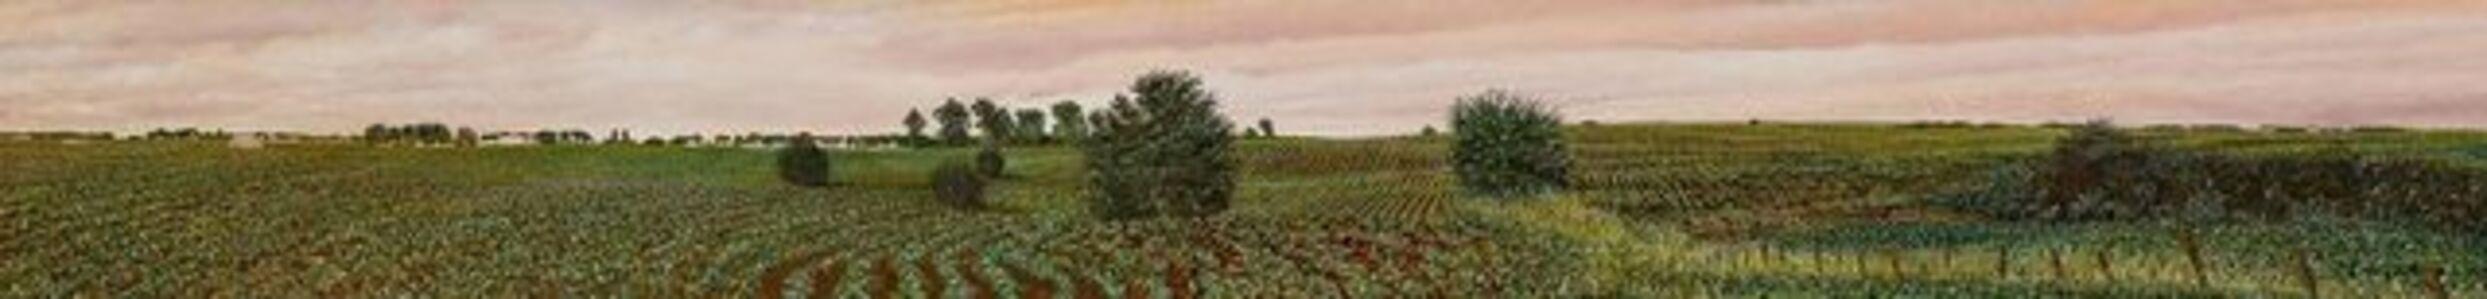 Illinois landscape #93